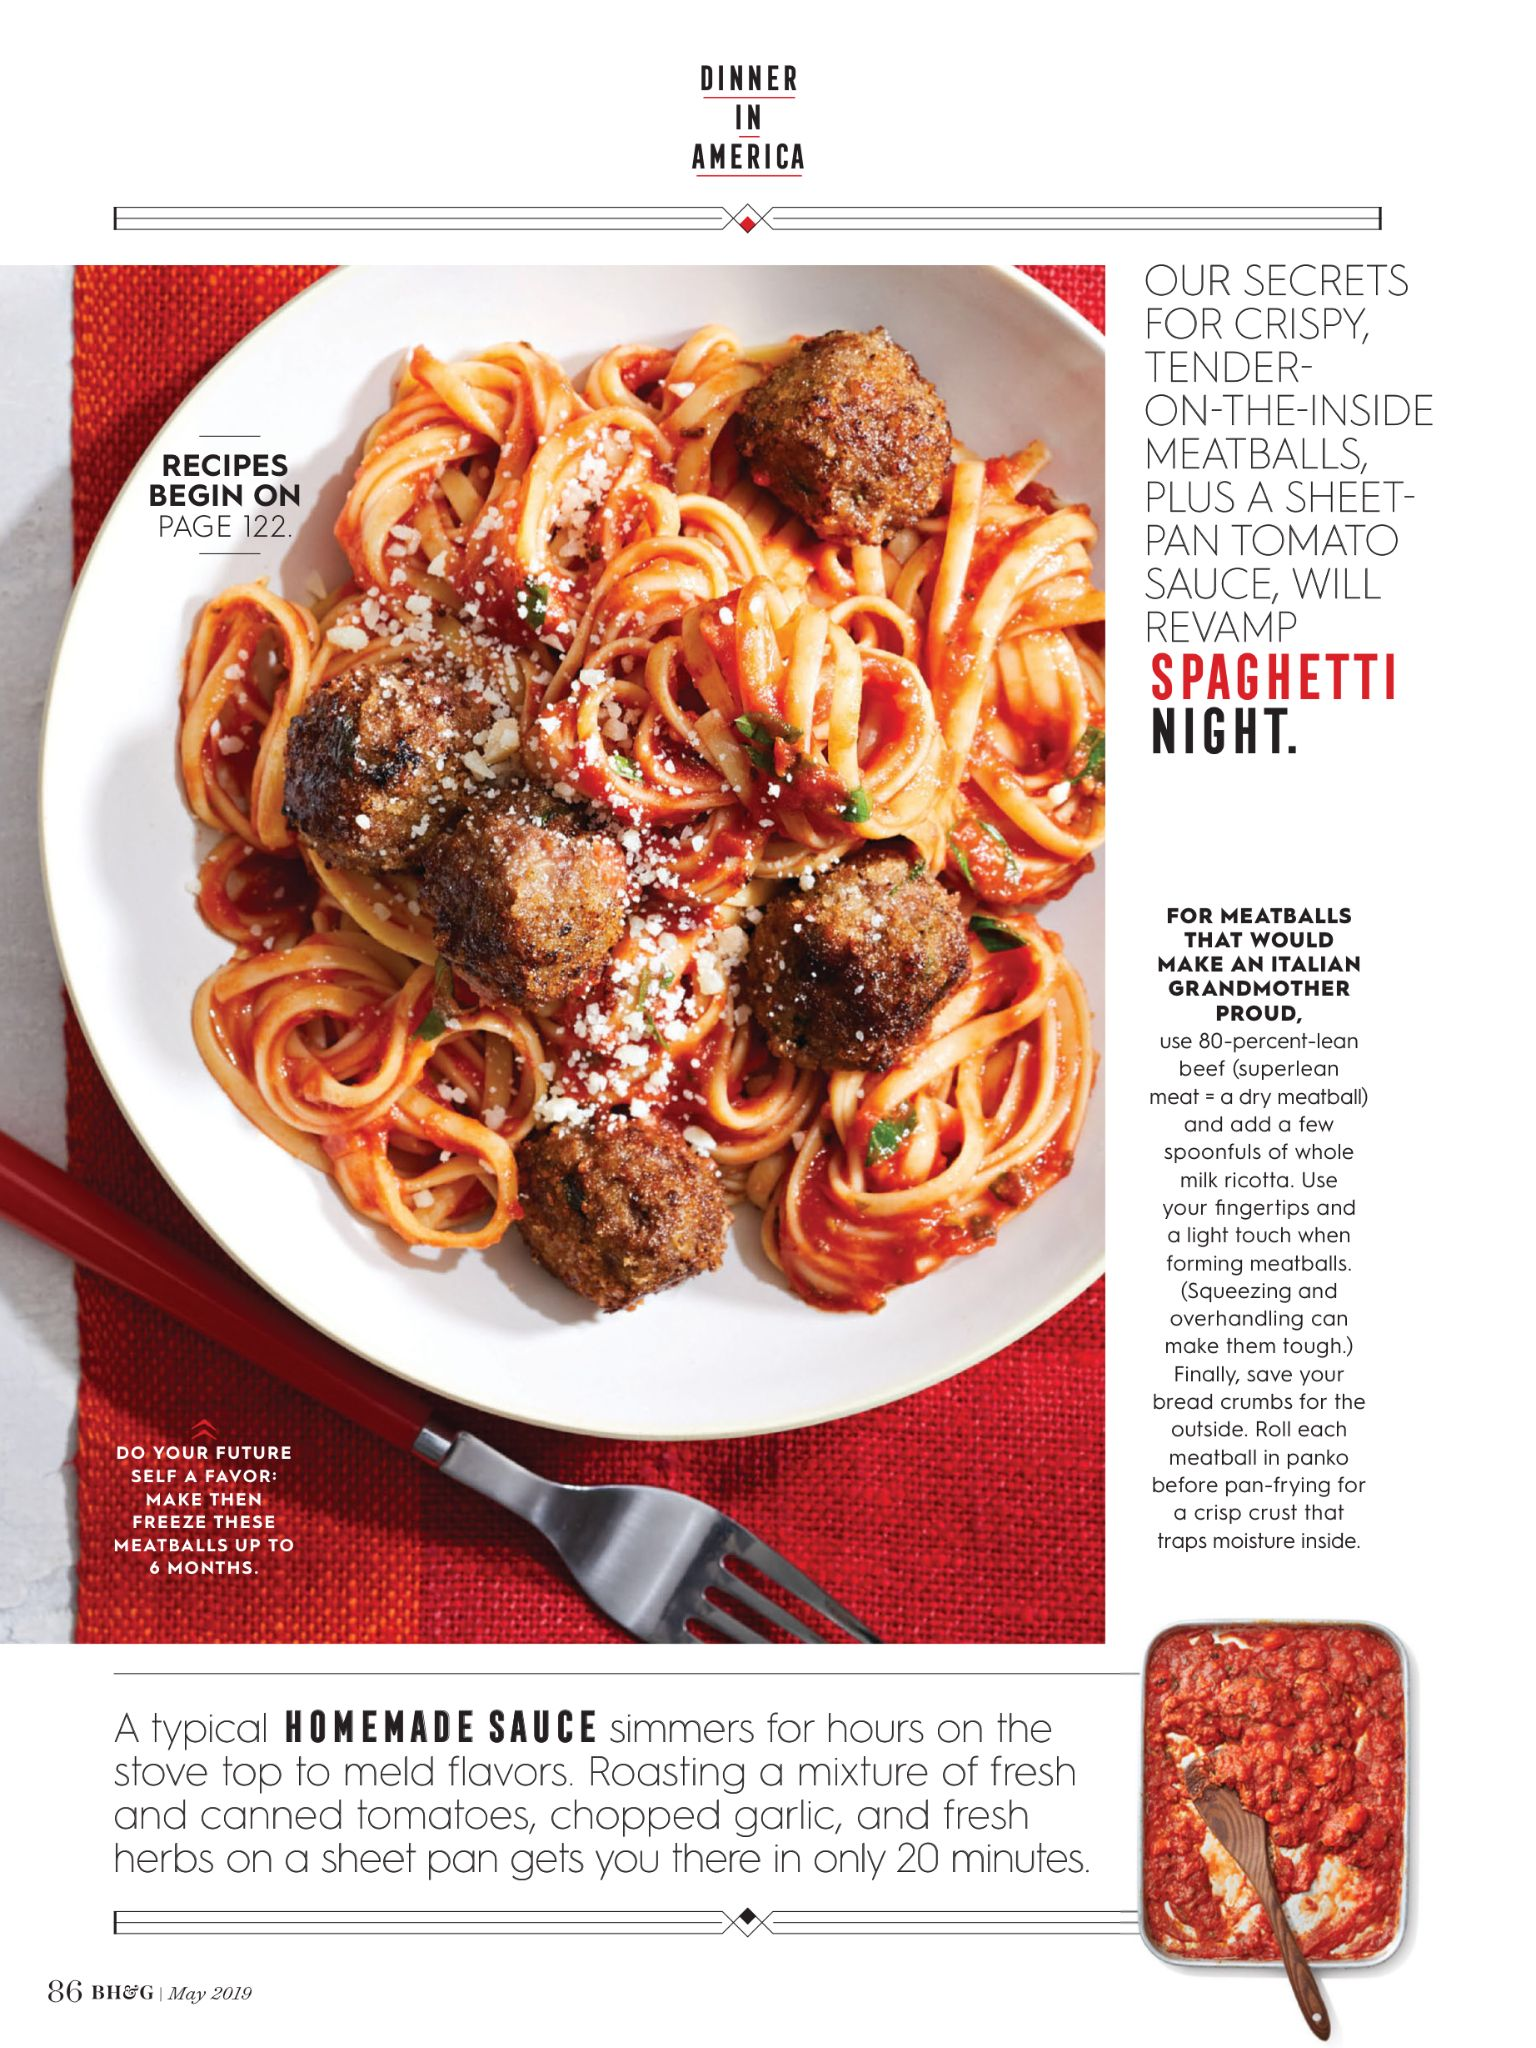 eb002df0ac3cdb2842632f2c970b8629 - Better Homes And Gardens Spaghetti And Meatballs Recipe